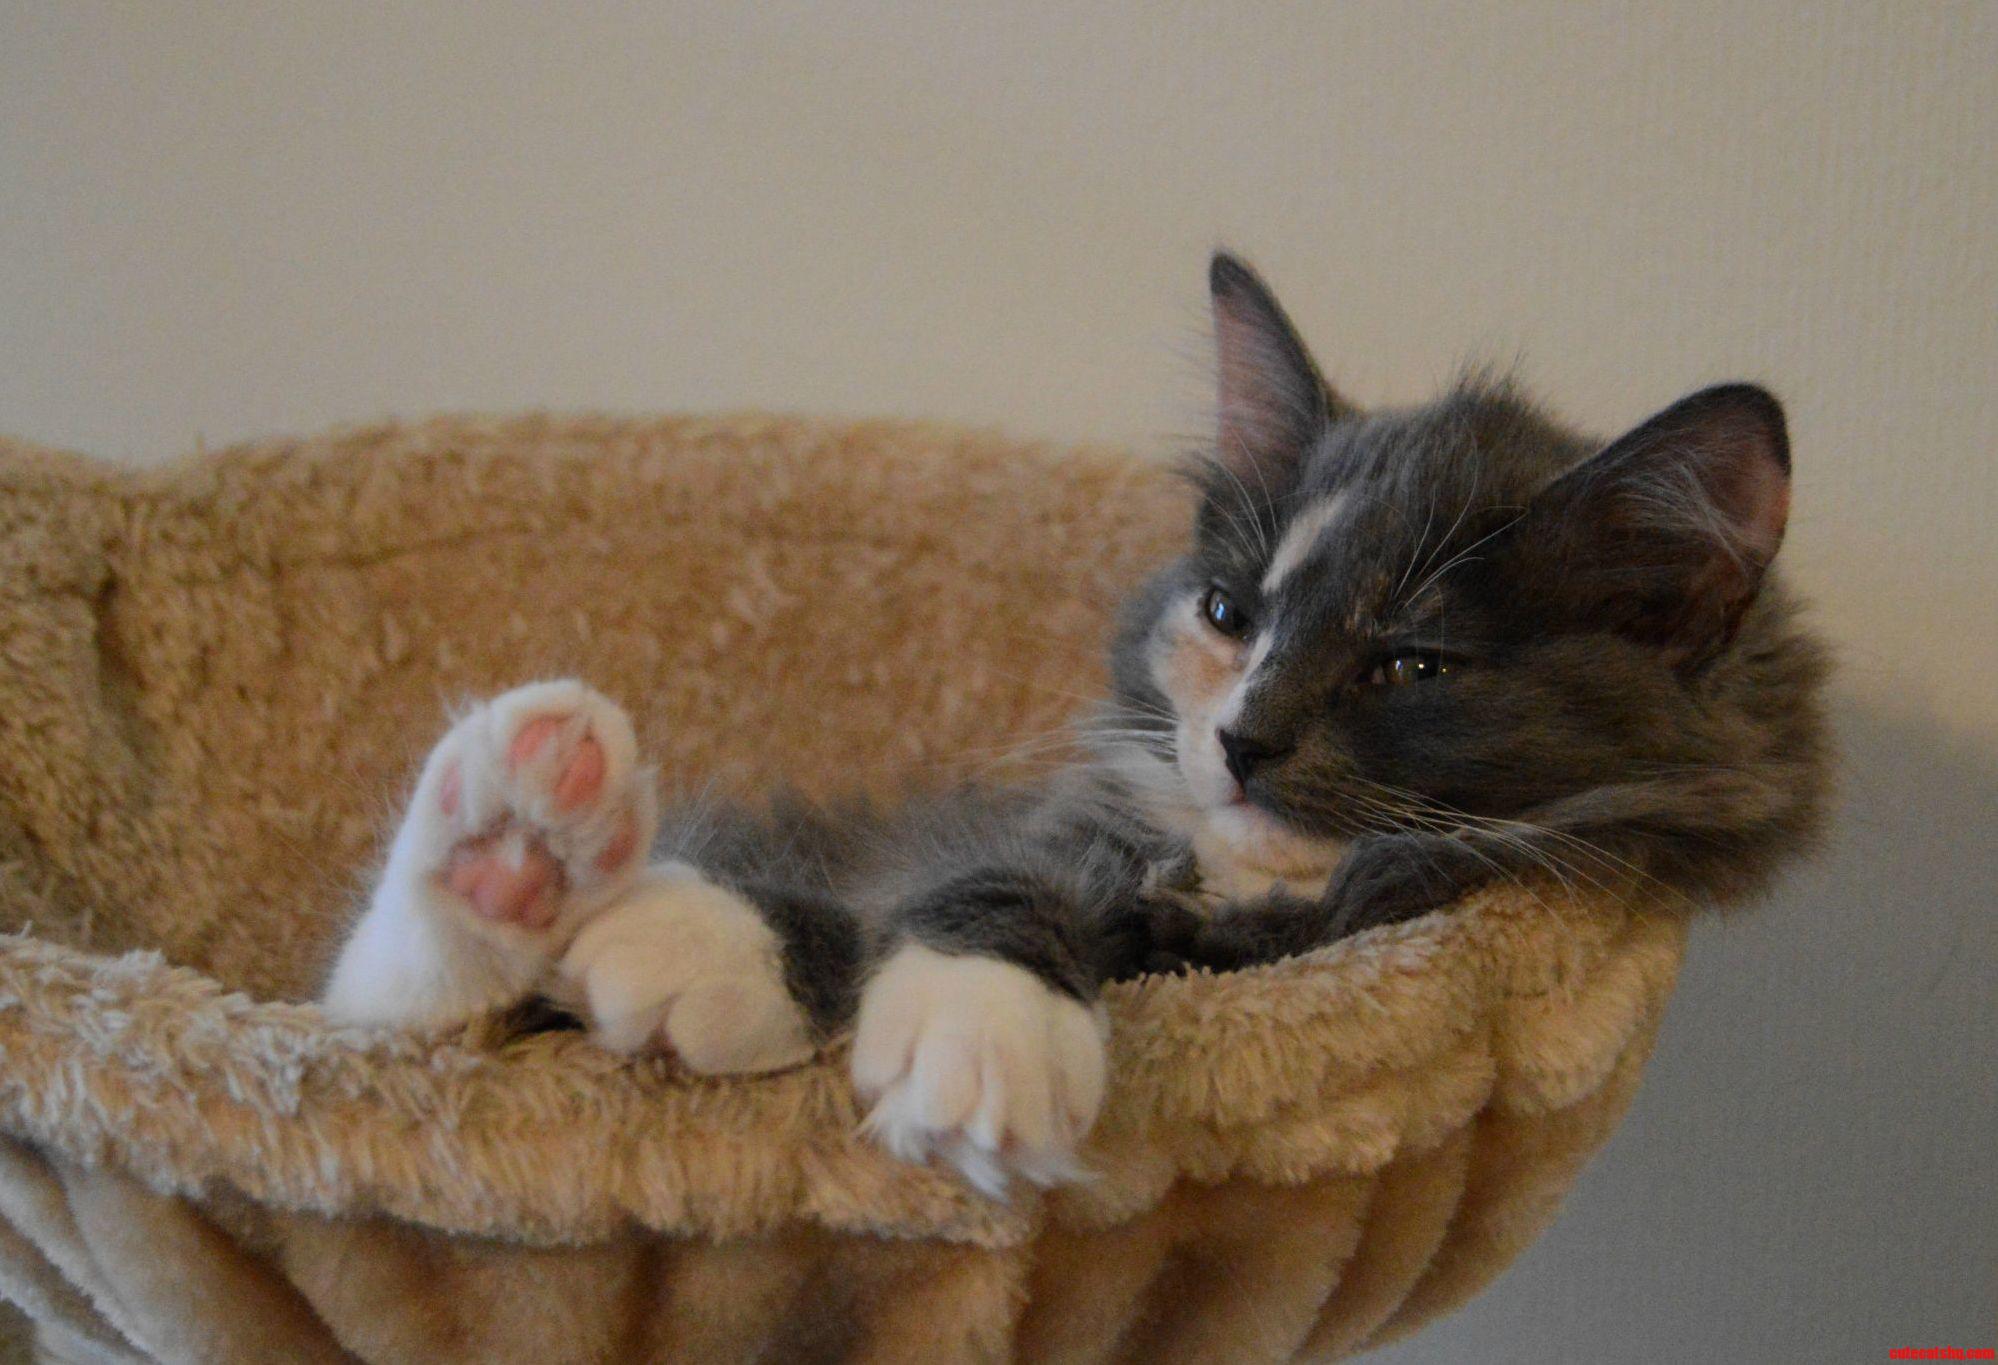 The most interesting kitten